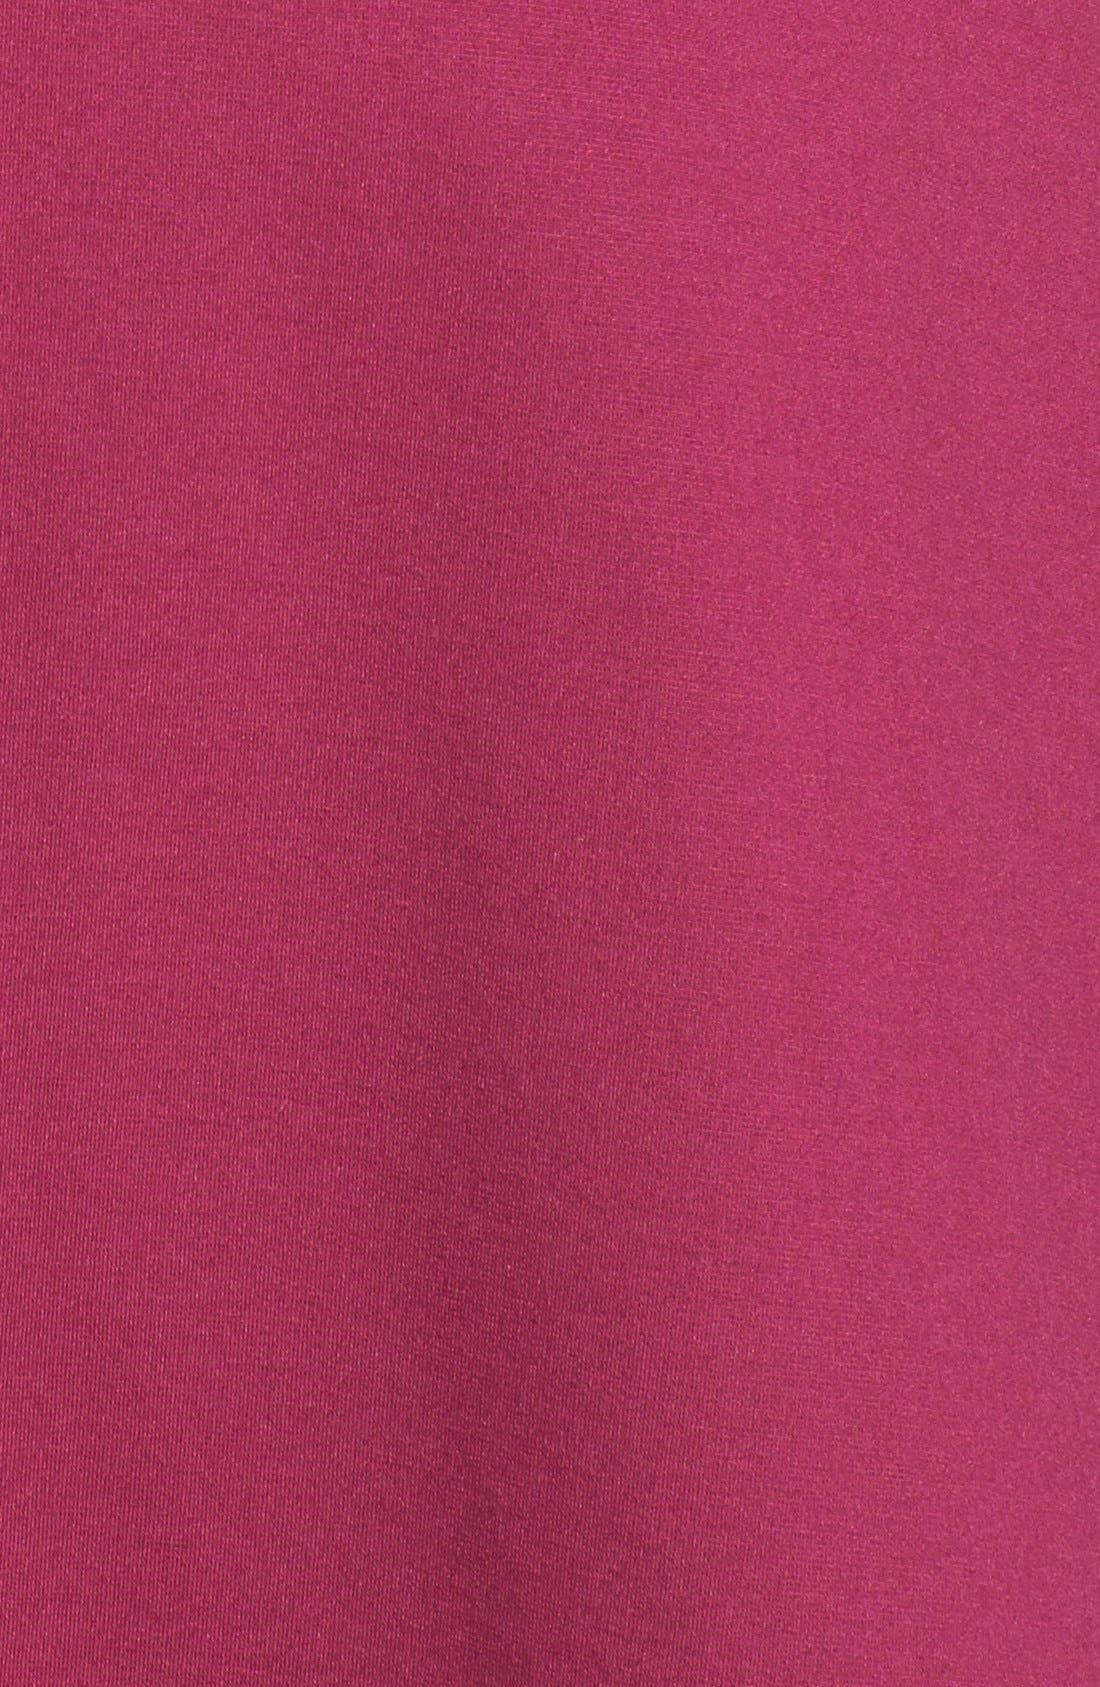 Alternate Image 3  - Jessica Simpson Lace Yoke Ponte Fit & Flare Dress